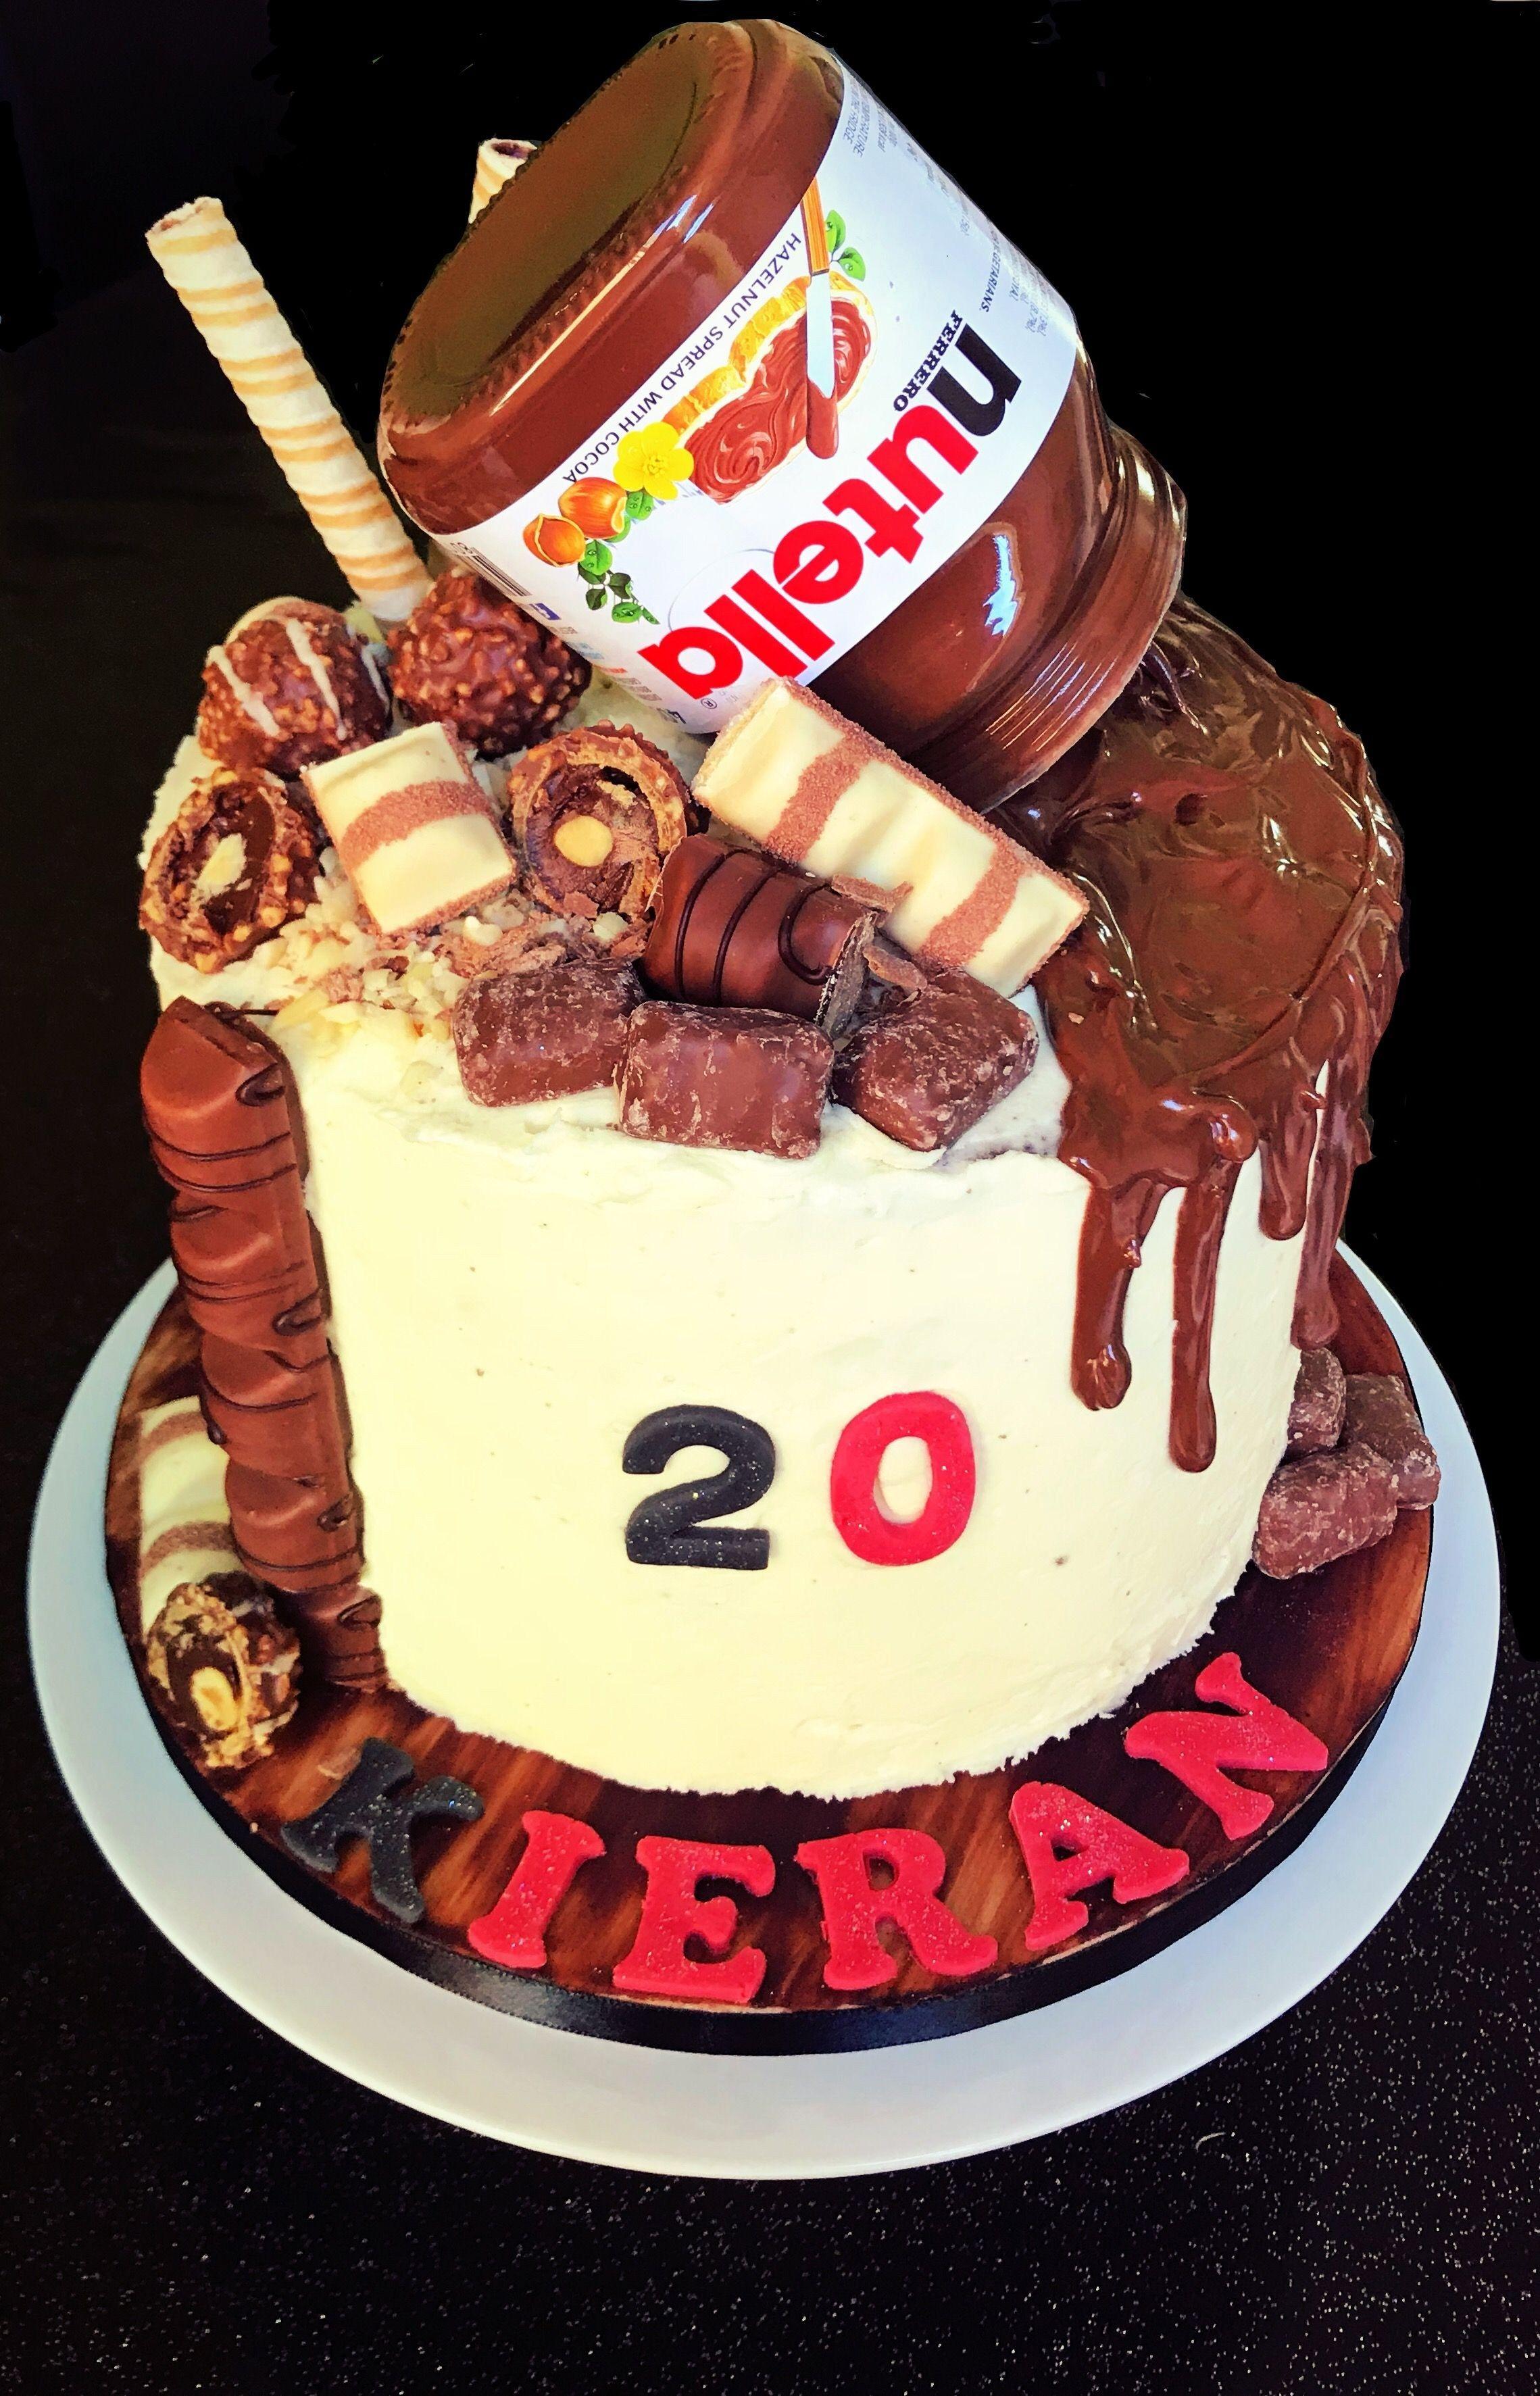 30 Pretty Photo Of Nutella Birthday Cake Nutella Birthday Cake Pin Elena Tsagrinou On Nutell Nutella Birthday Cake Birthday Cake Recipe Nutella Recipes Cake